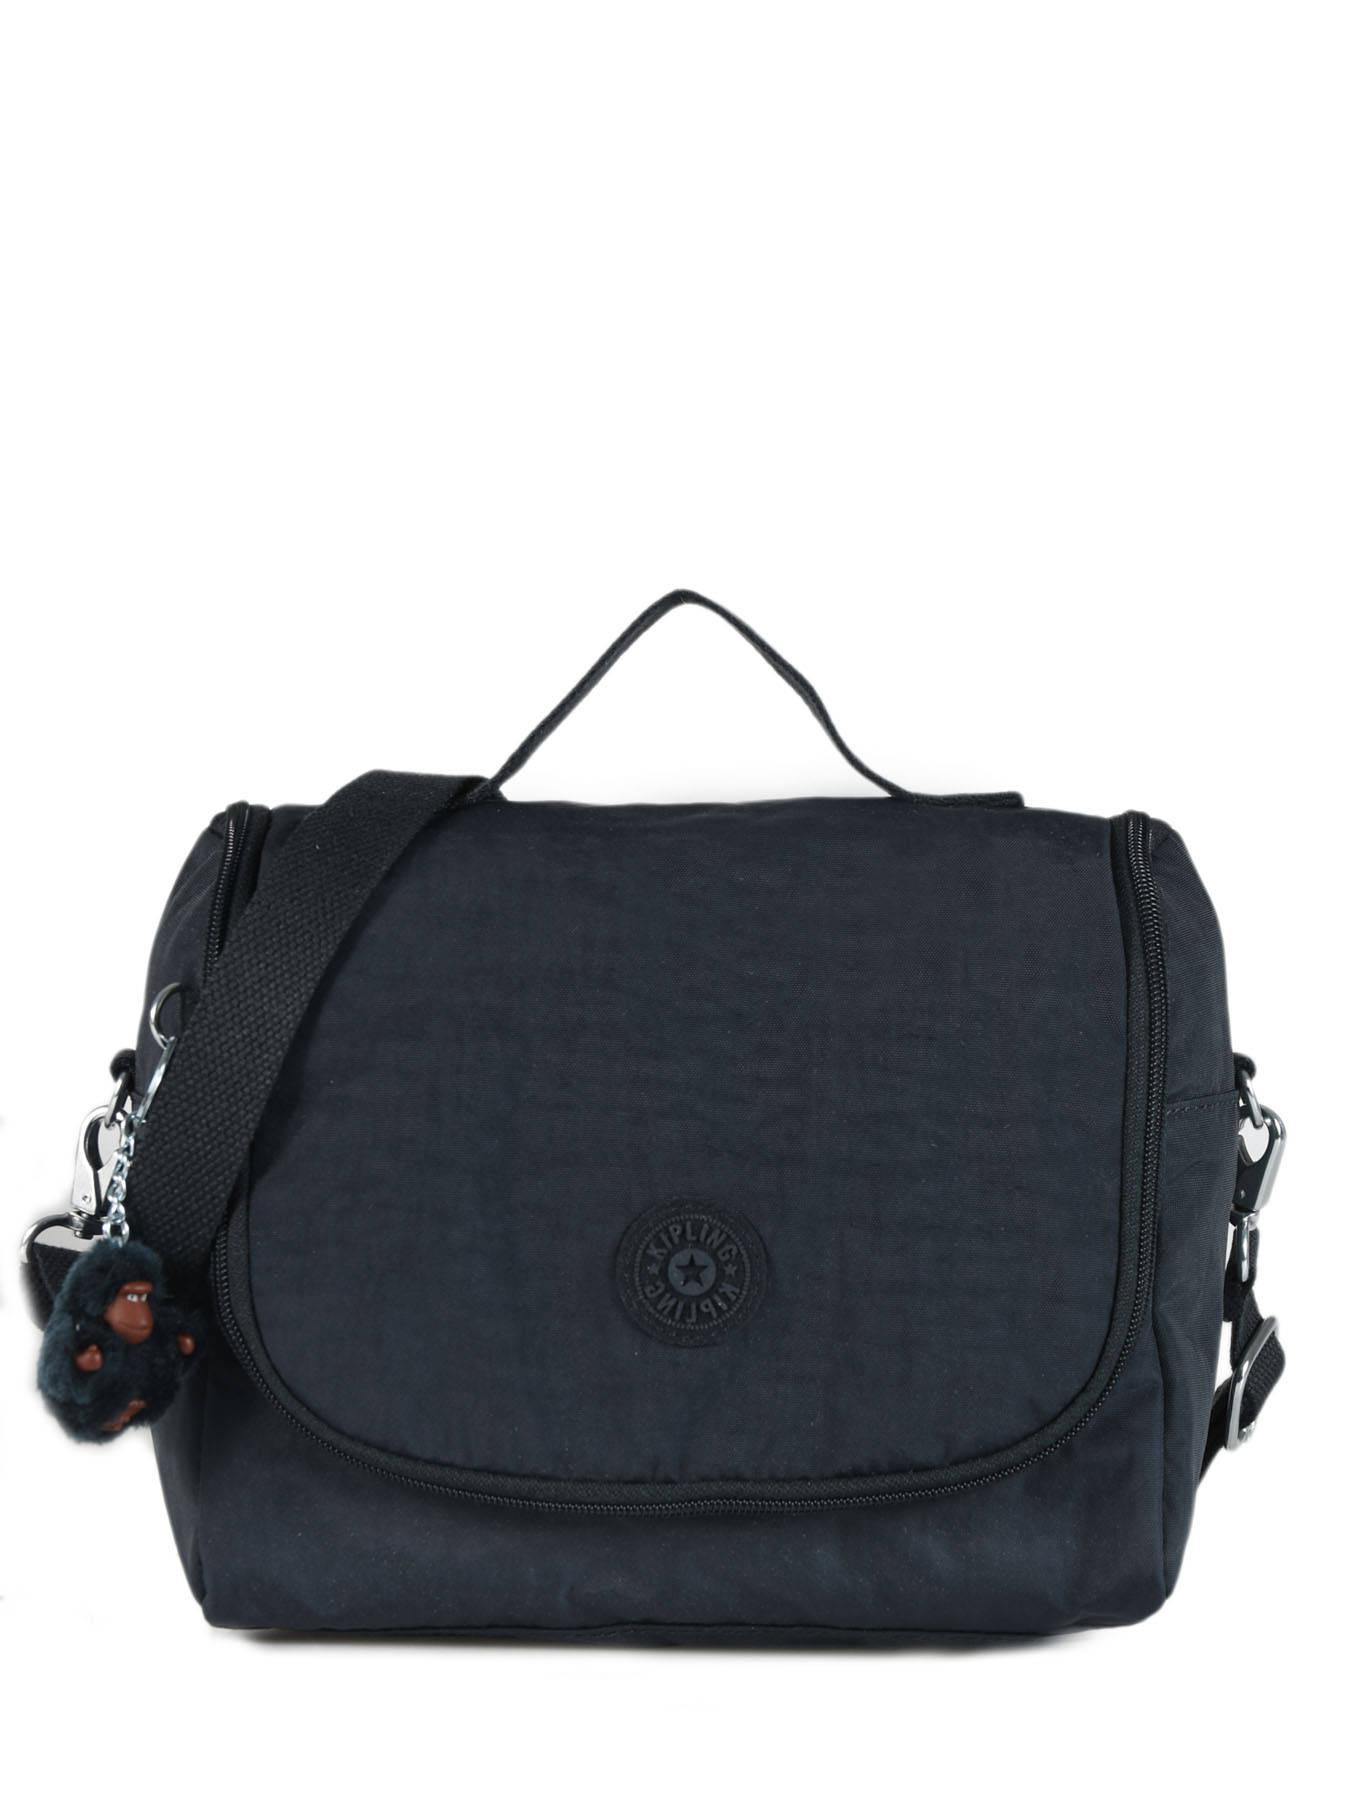 Lunch Bag 1 Compartment Kipling